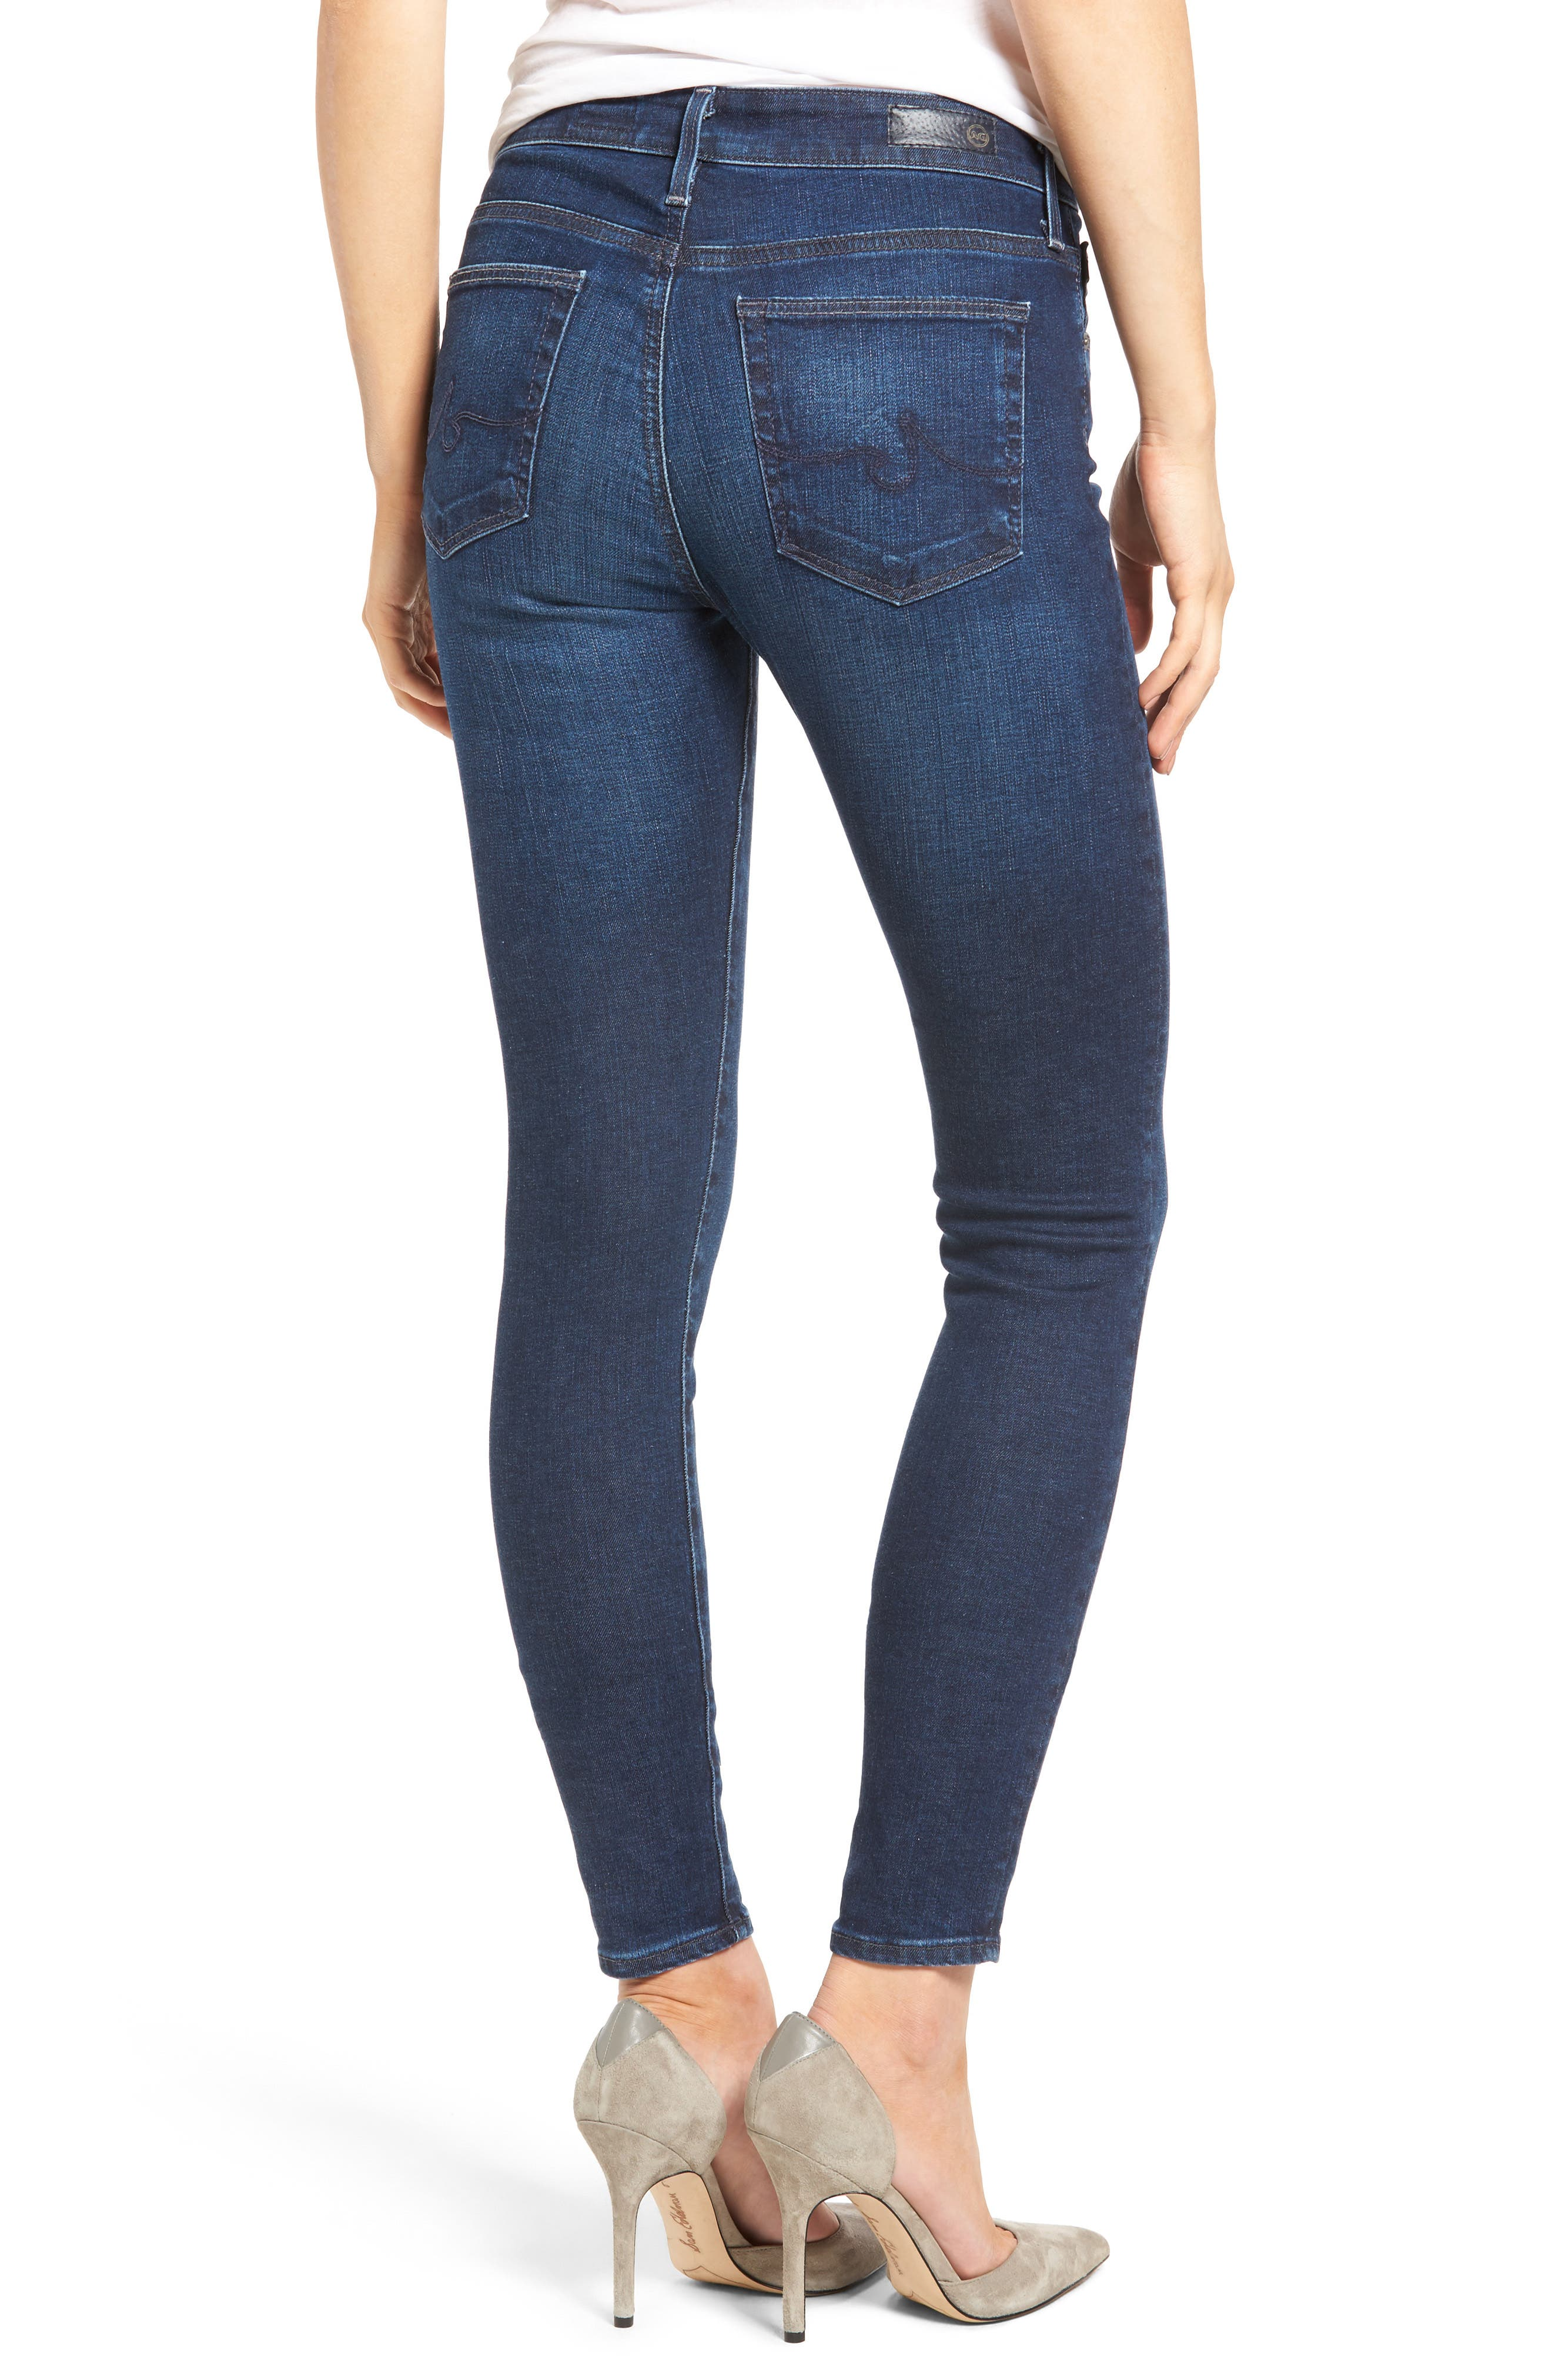 'The Farrah' High Rise Skinny Jeans,                             Alternate thumbnail 19, color,